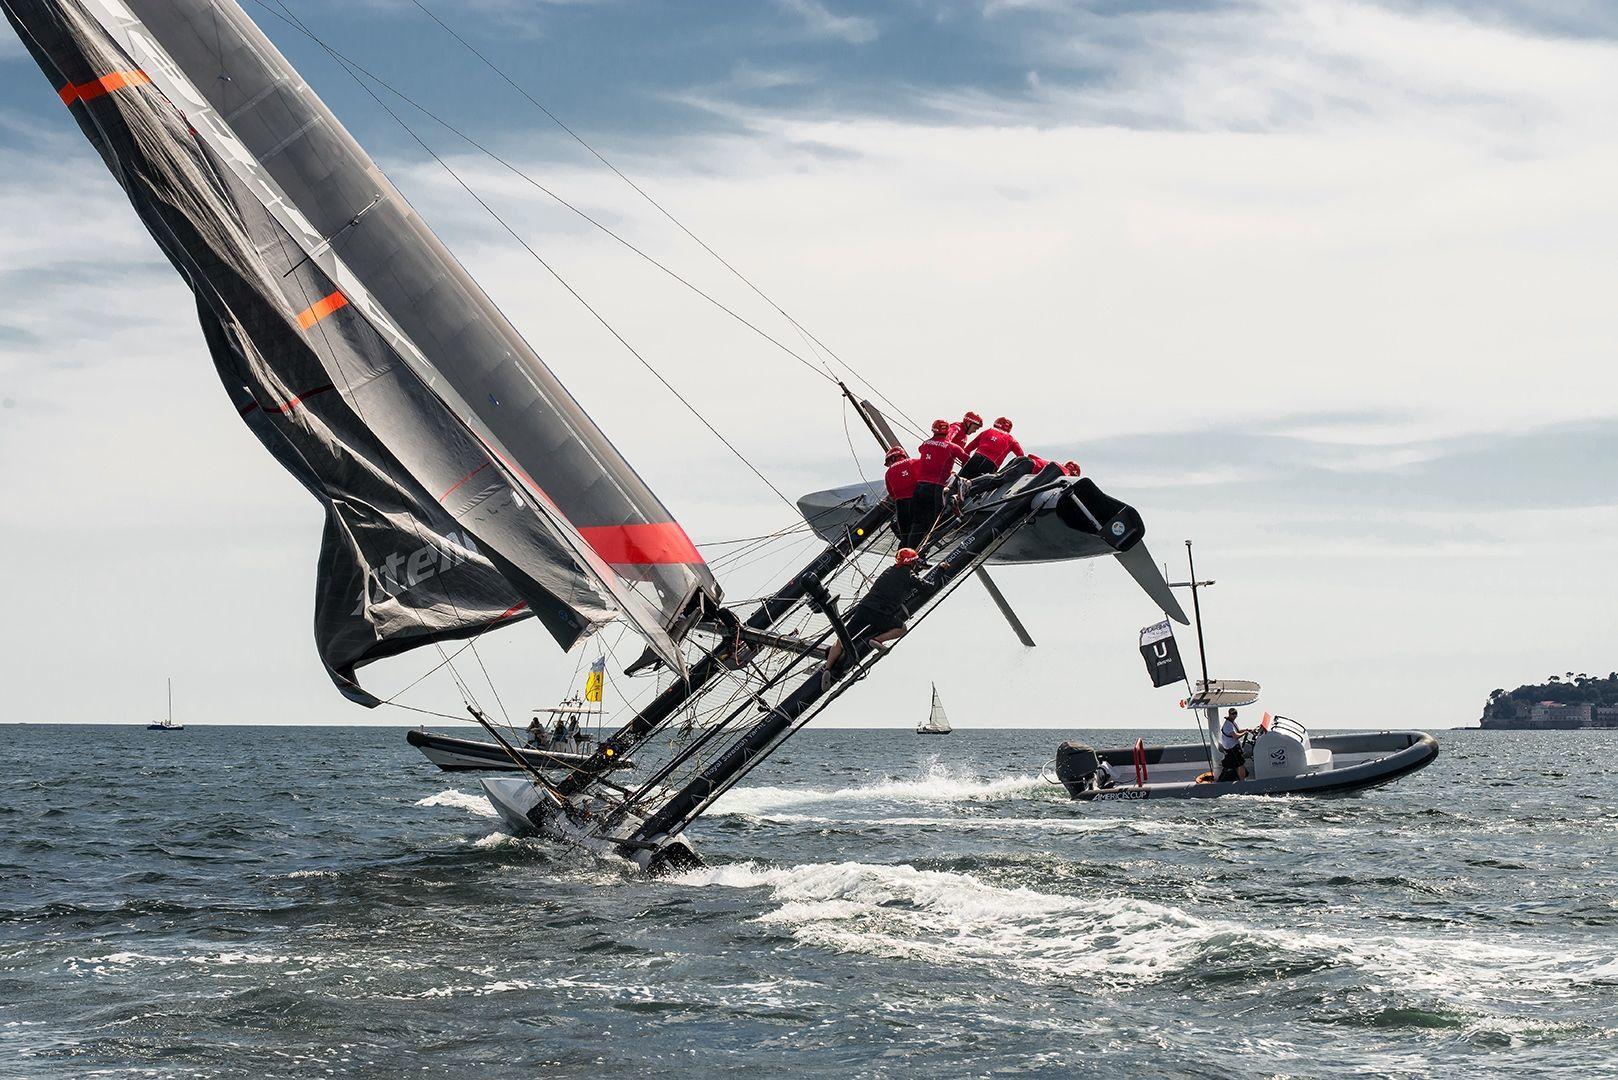 america s cup artemis capsizing vela di angelo florio fotografo pubblicitario sailing race napoli roma